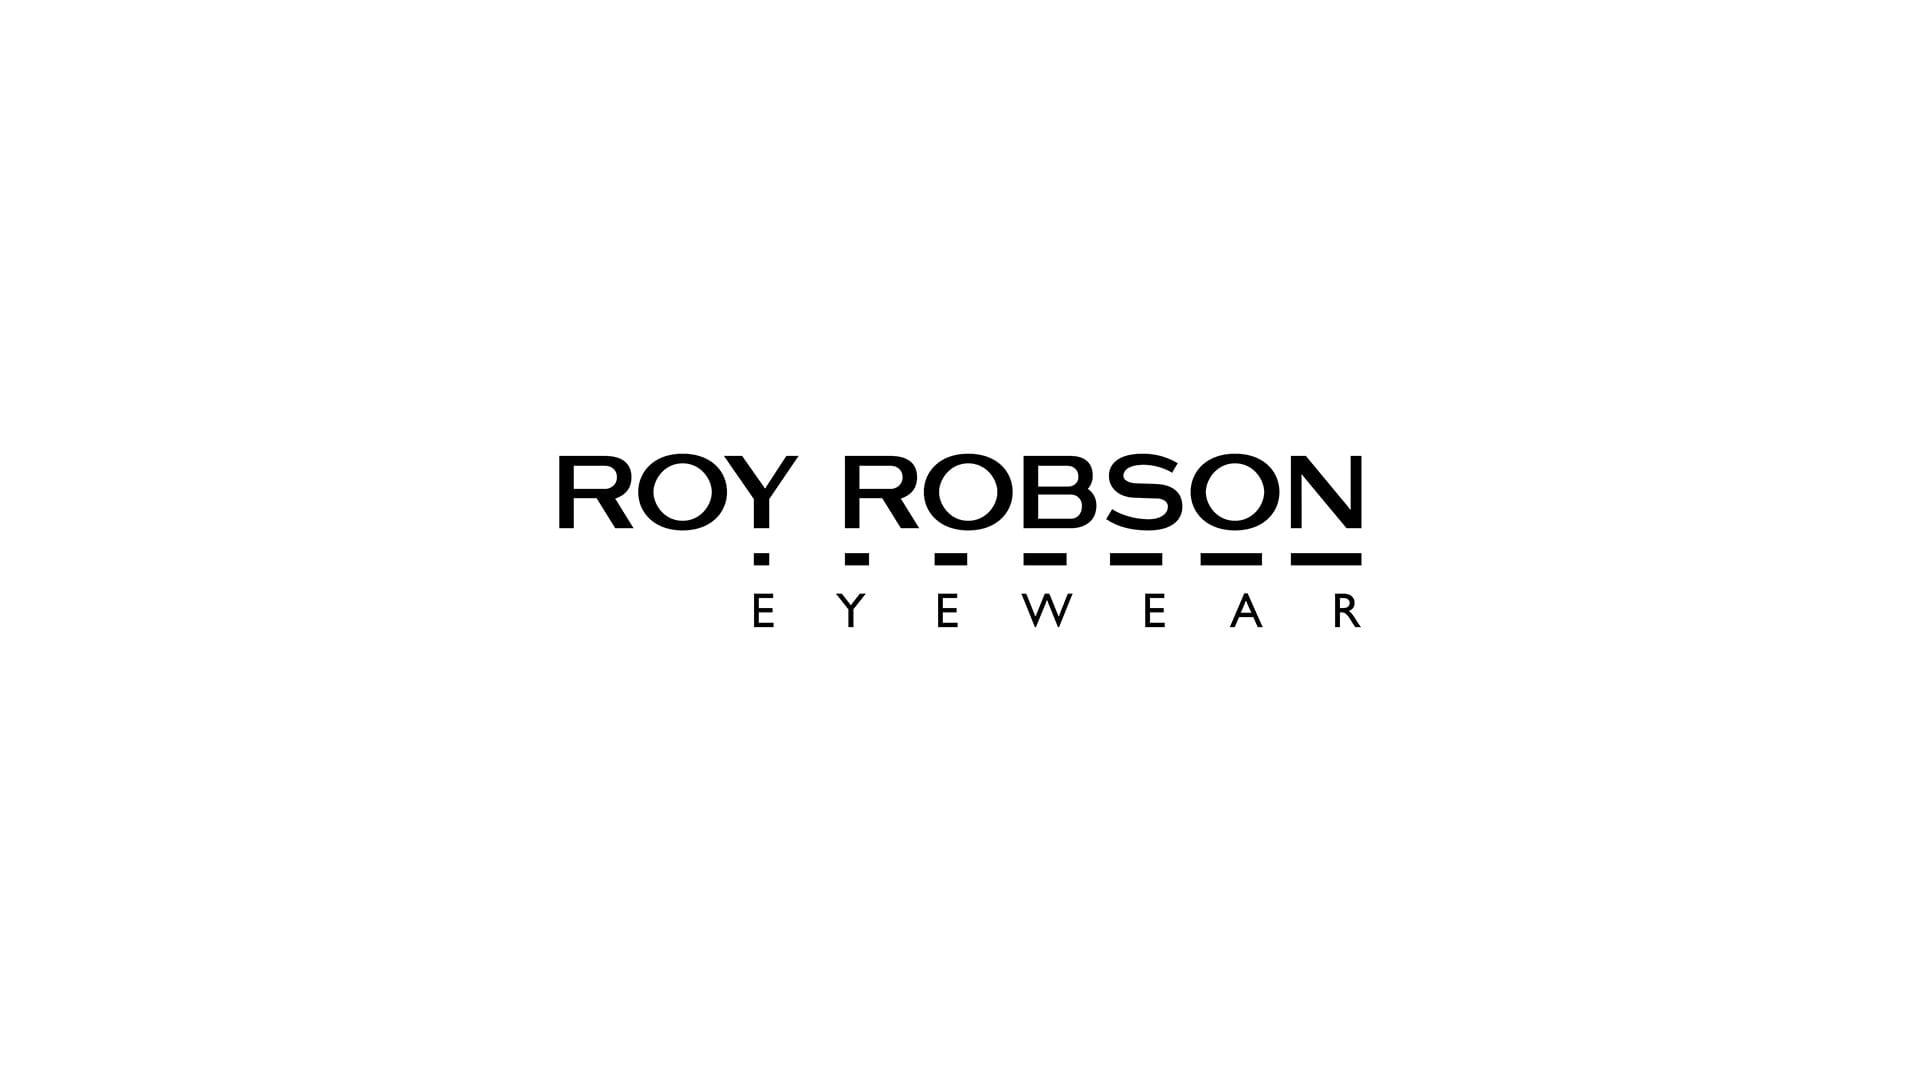 Roy Robson